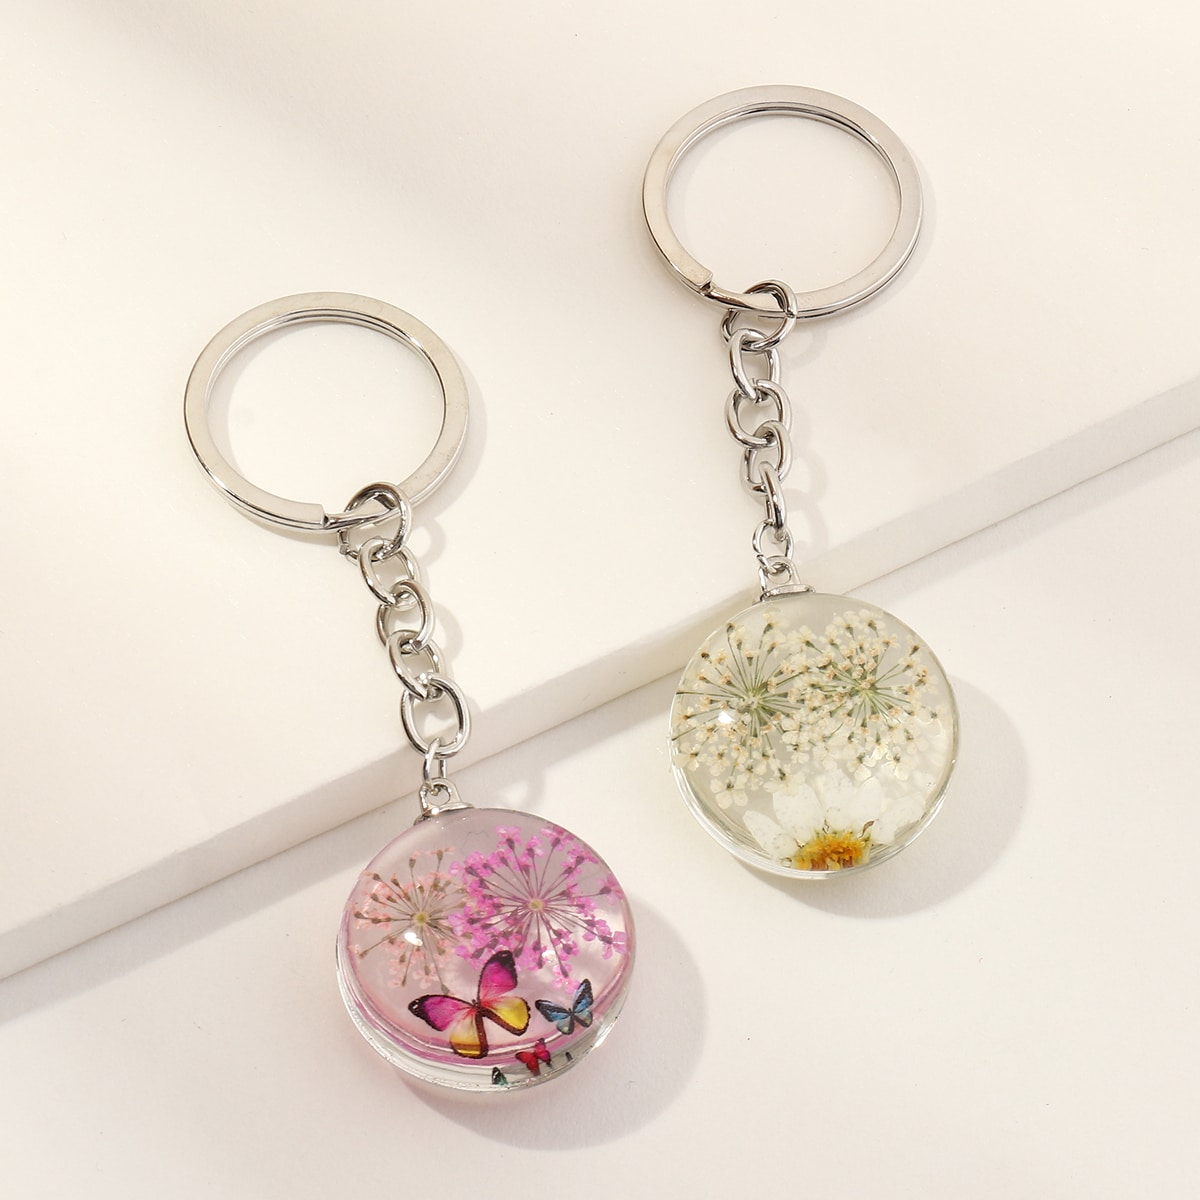 2pcs Flower Round Charm Keychain